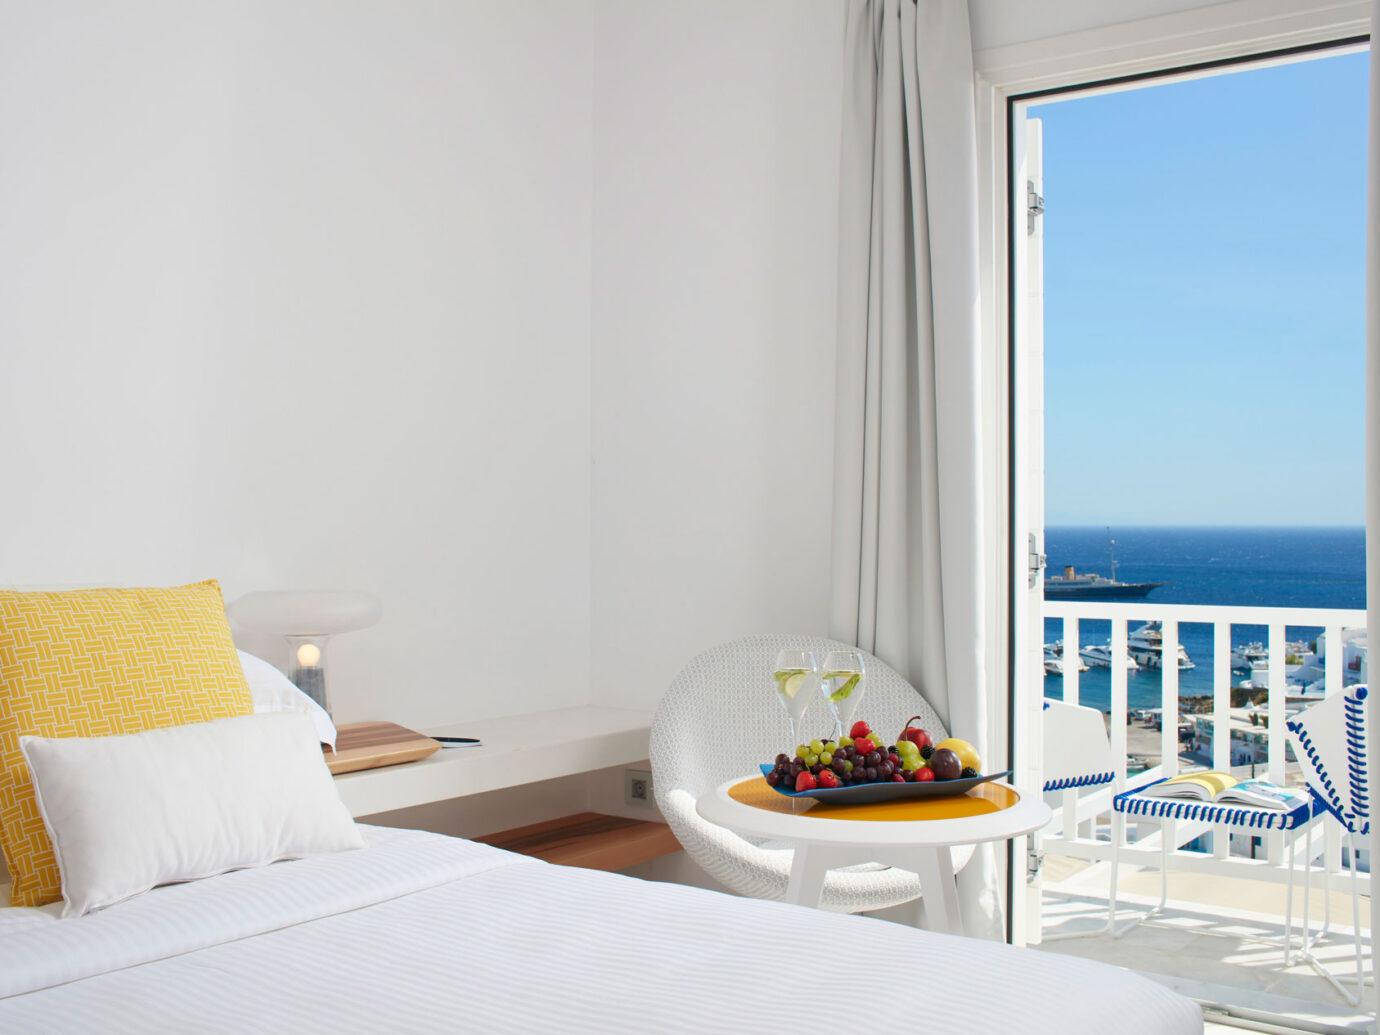 guestrrom at Myconian Ambassador Hotel, Greece